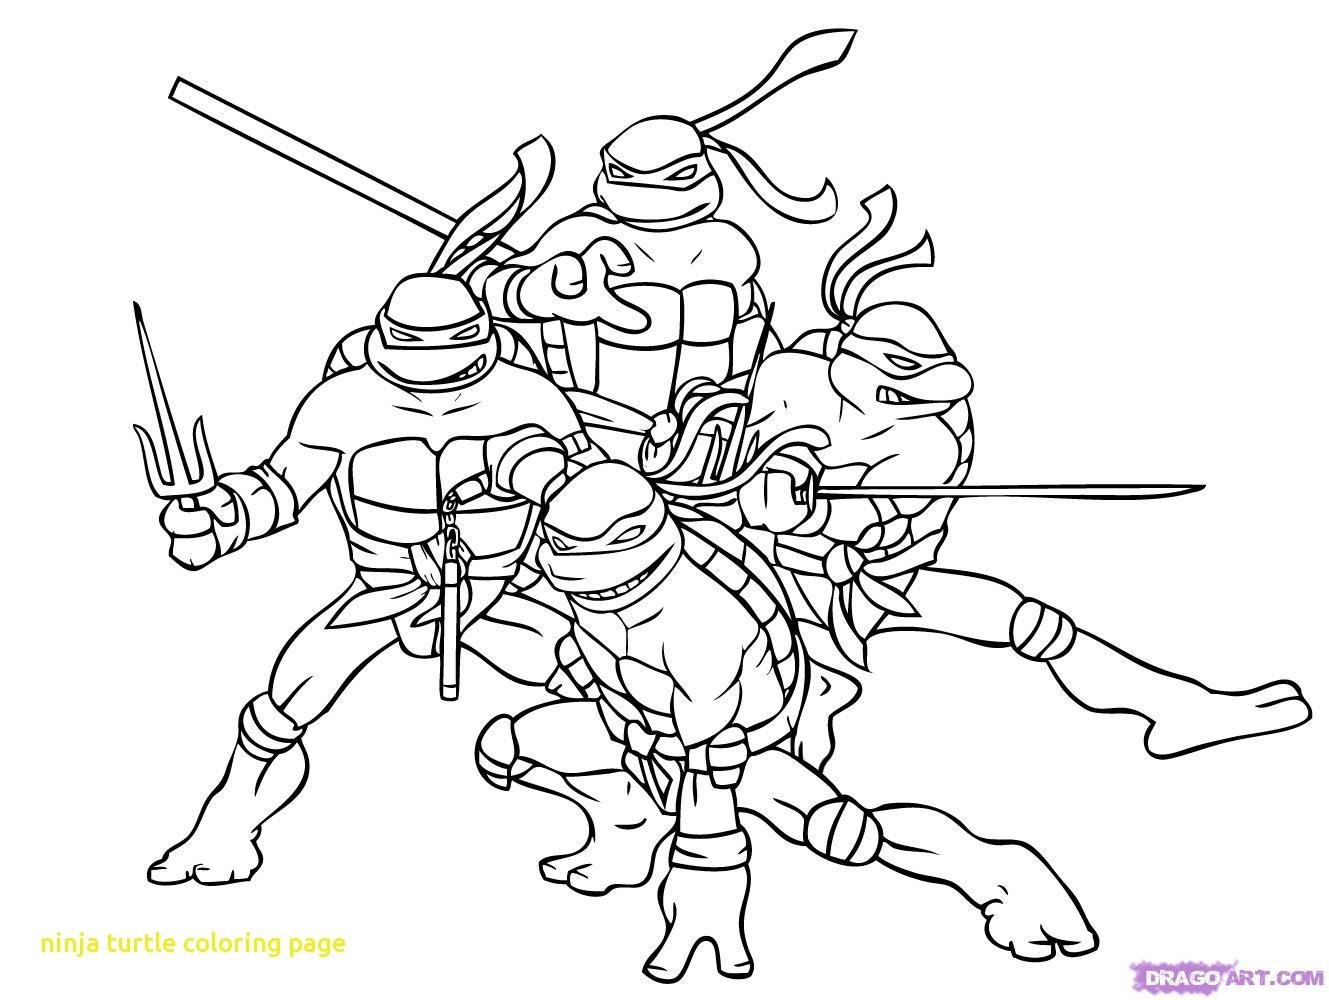 1329x1000 Ninja Turtle Coloring Page With Wonderful Ninja Turtles Donatello